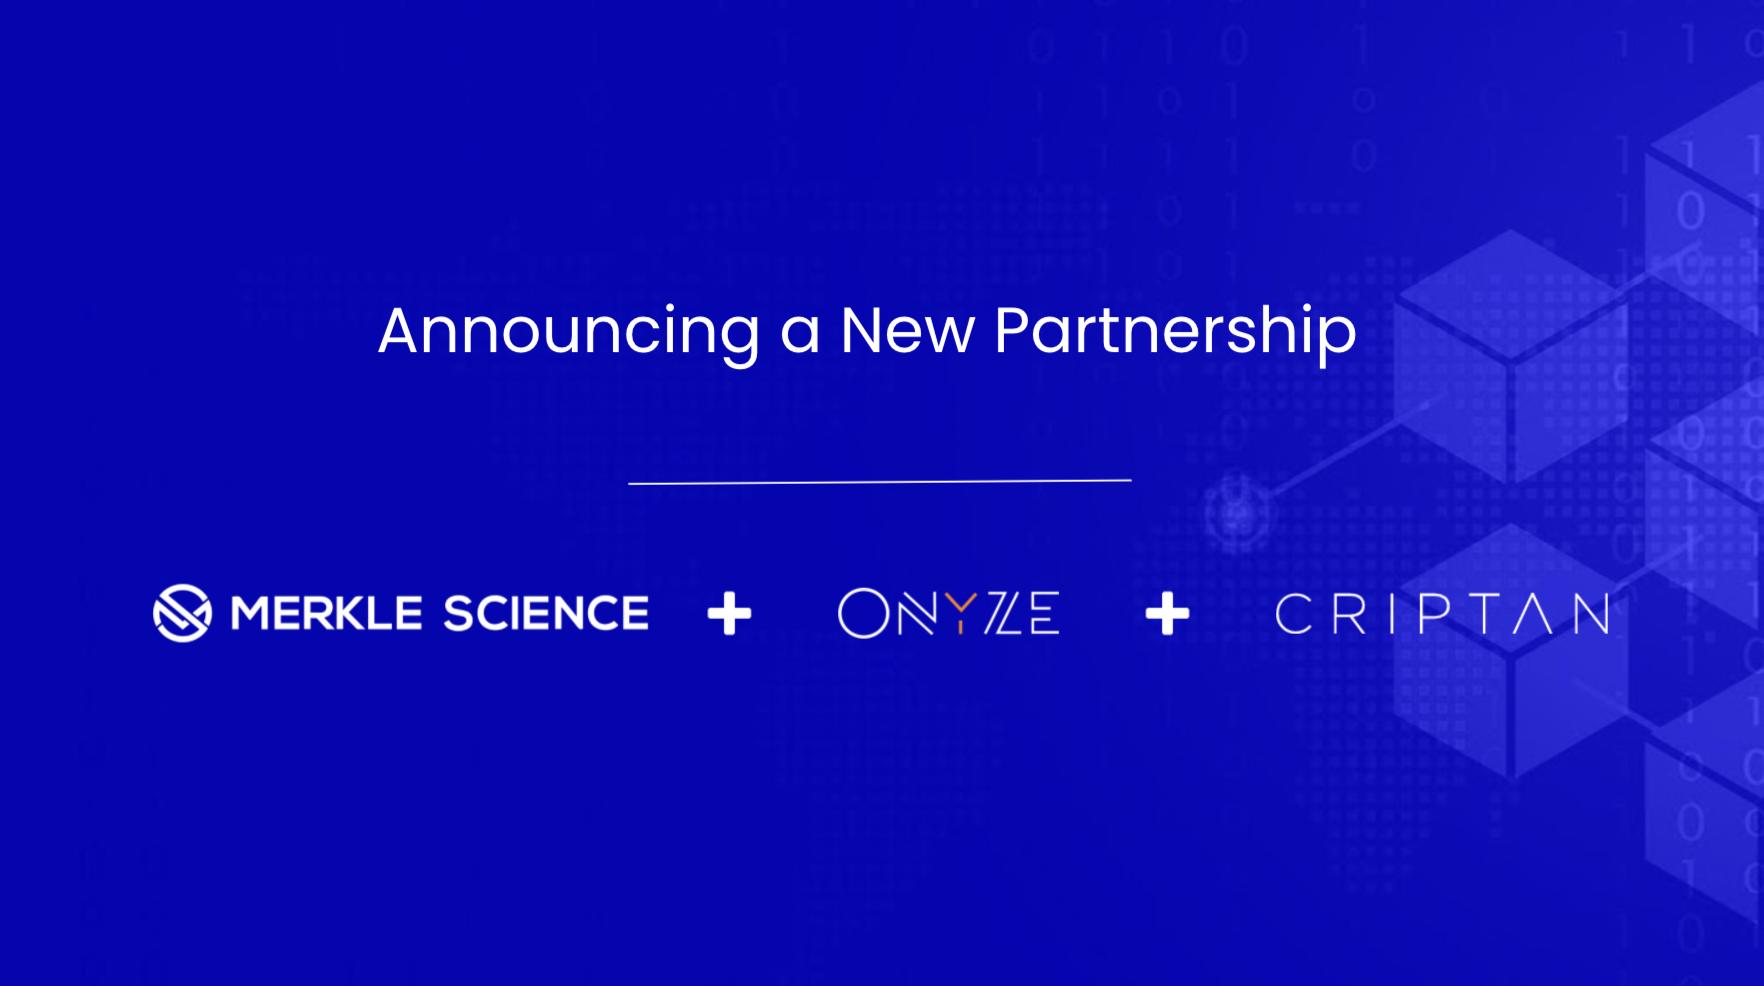 Merkle Science partnerships